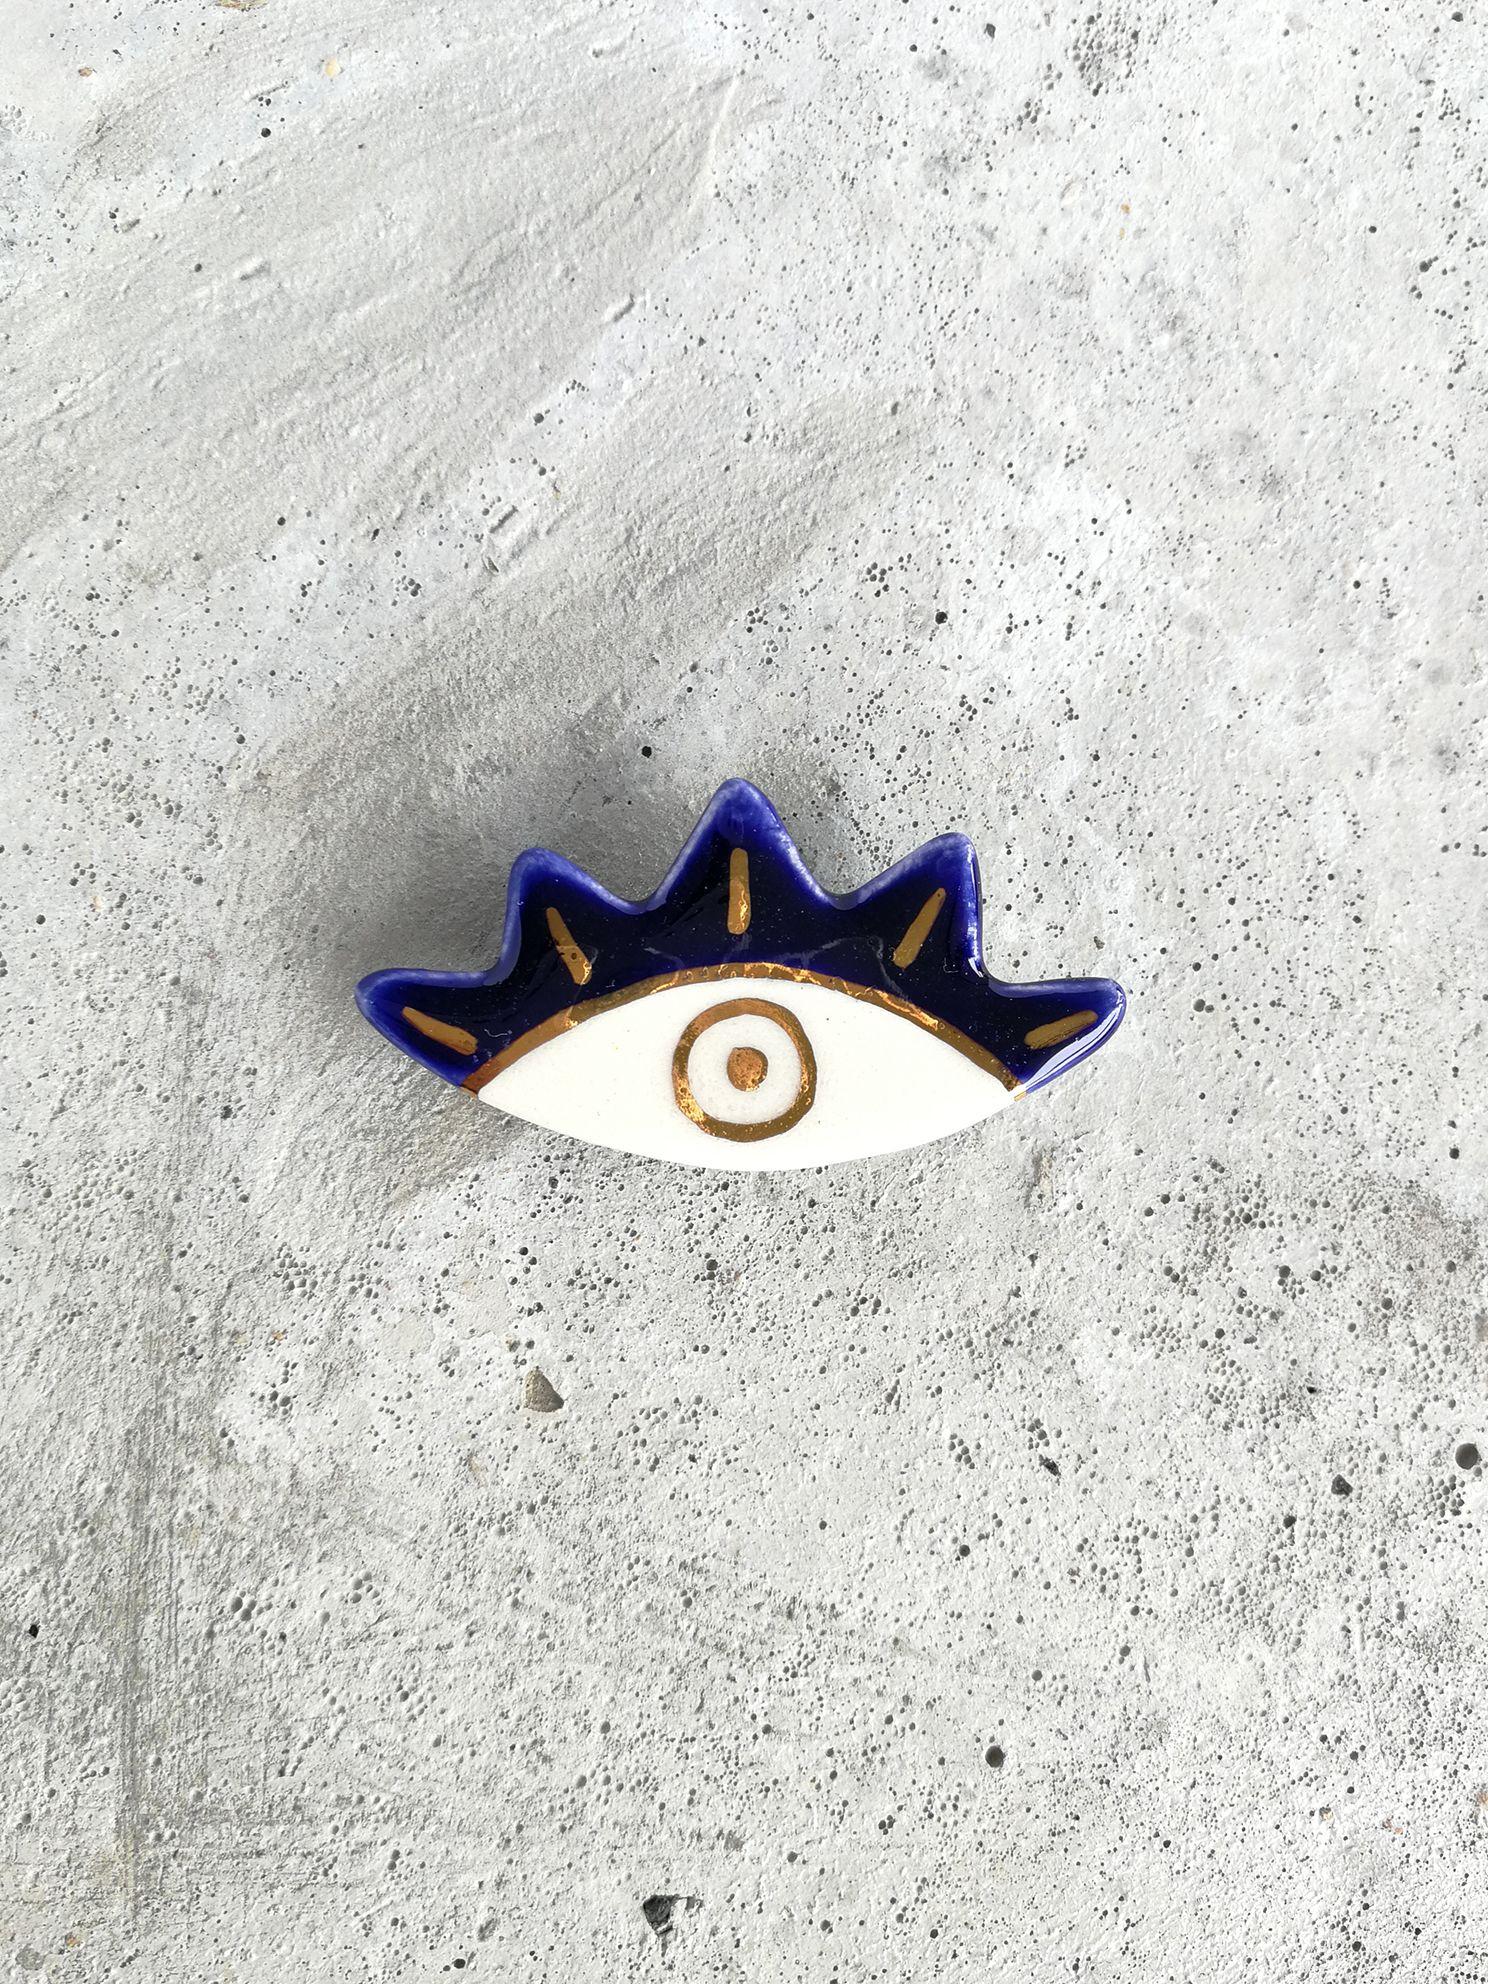 Prendedor de Cerámica Ojo Rayos Oro Azul